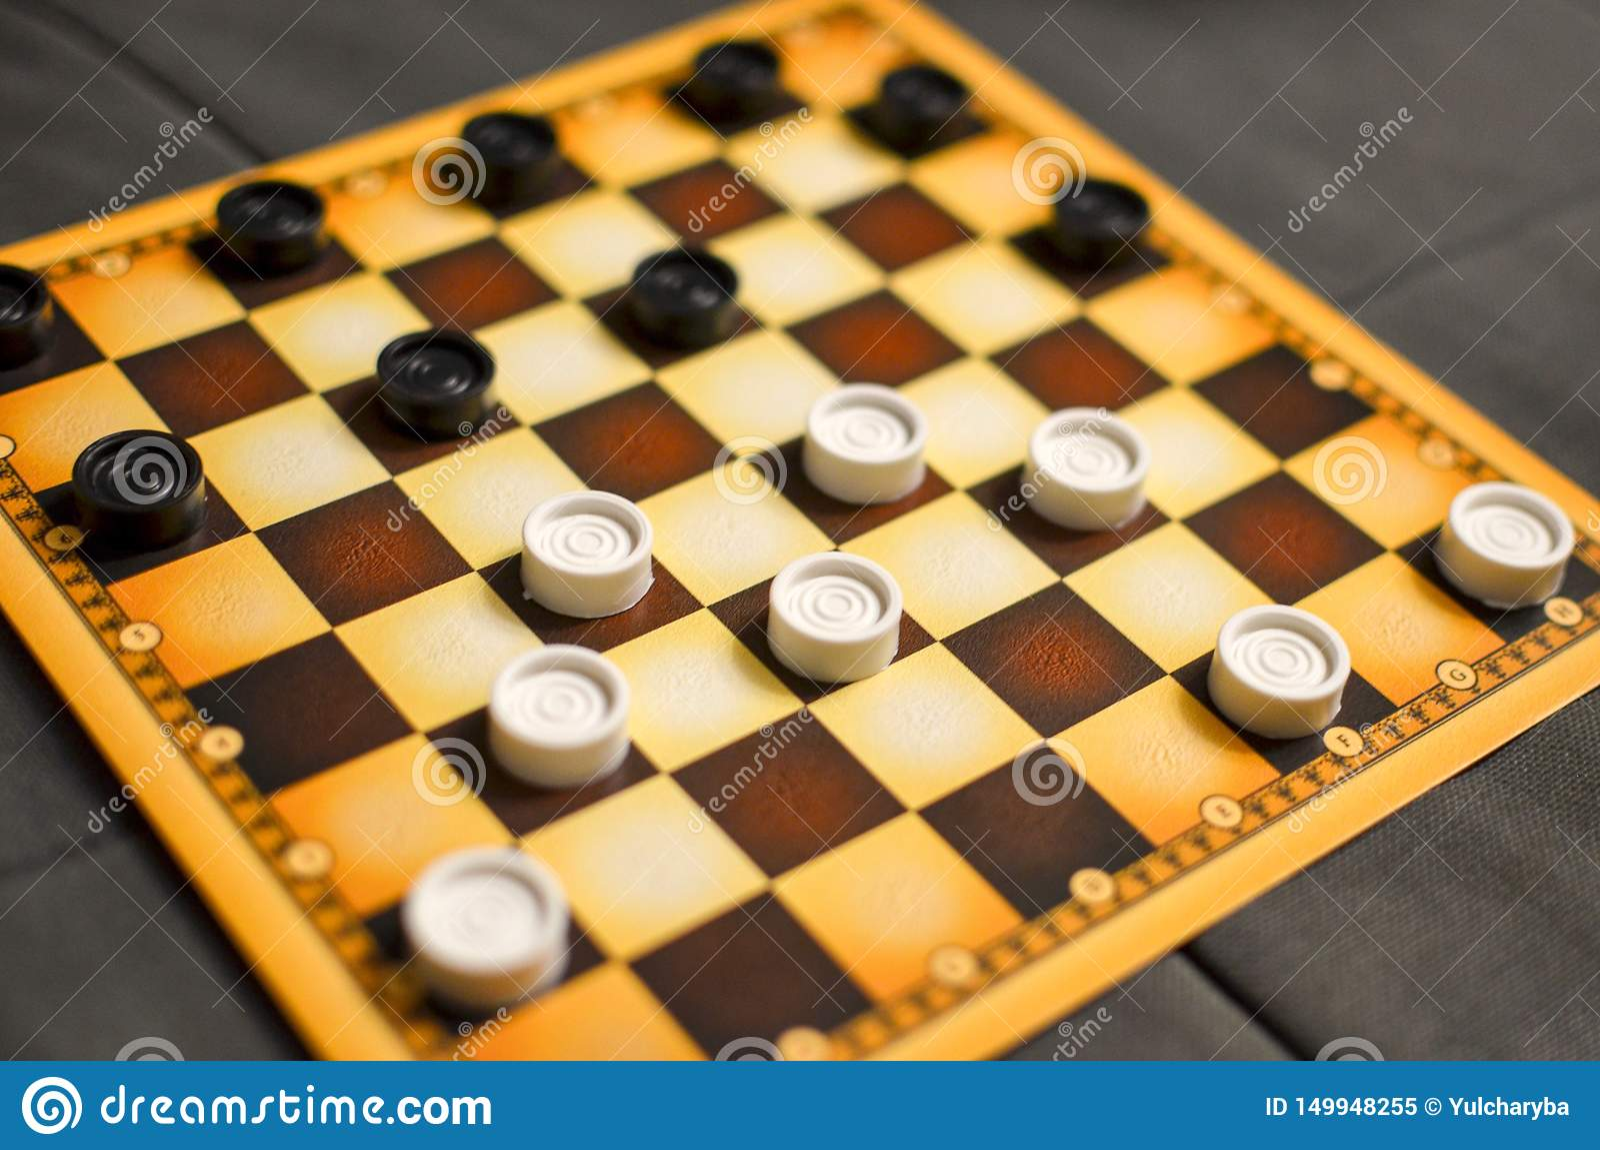 Checkerboard με τους ελεγκτές Ανταγωνισμός επιχειρησιακής στρατηγικής, στρατηγικός προγραμματισμός για τη νίκη της επιτυχίας Χόμπ